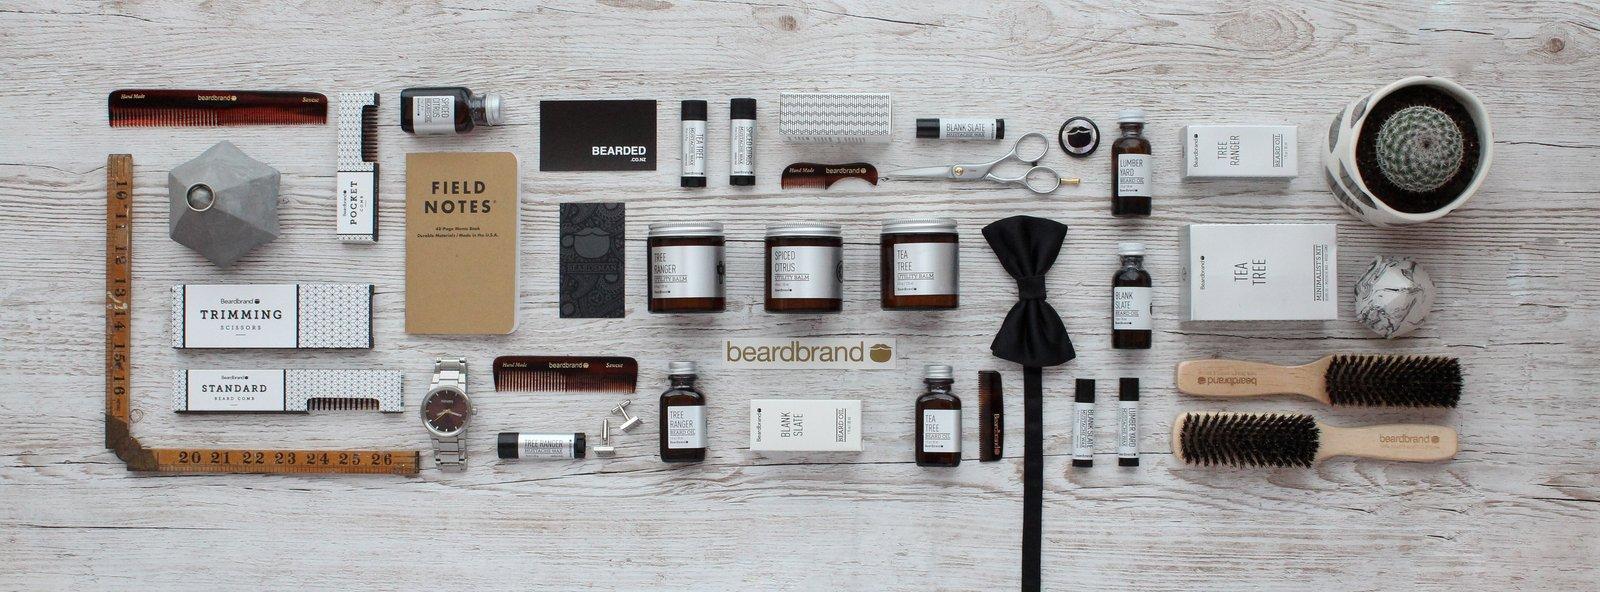 Beardbrand products